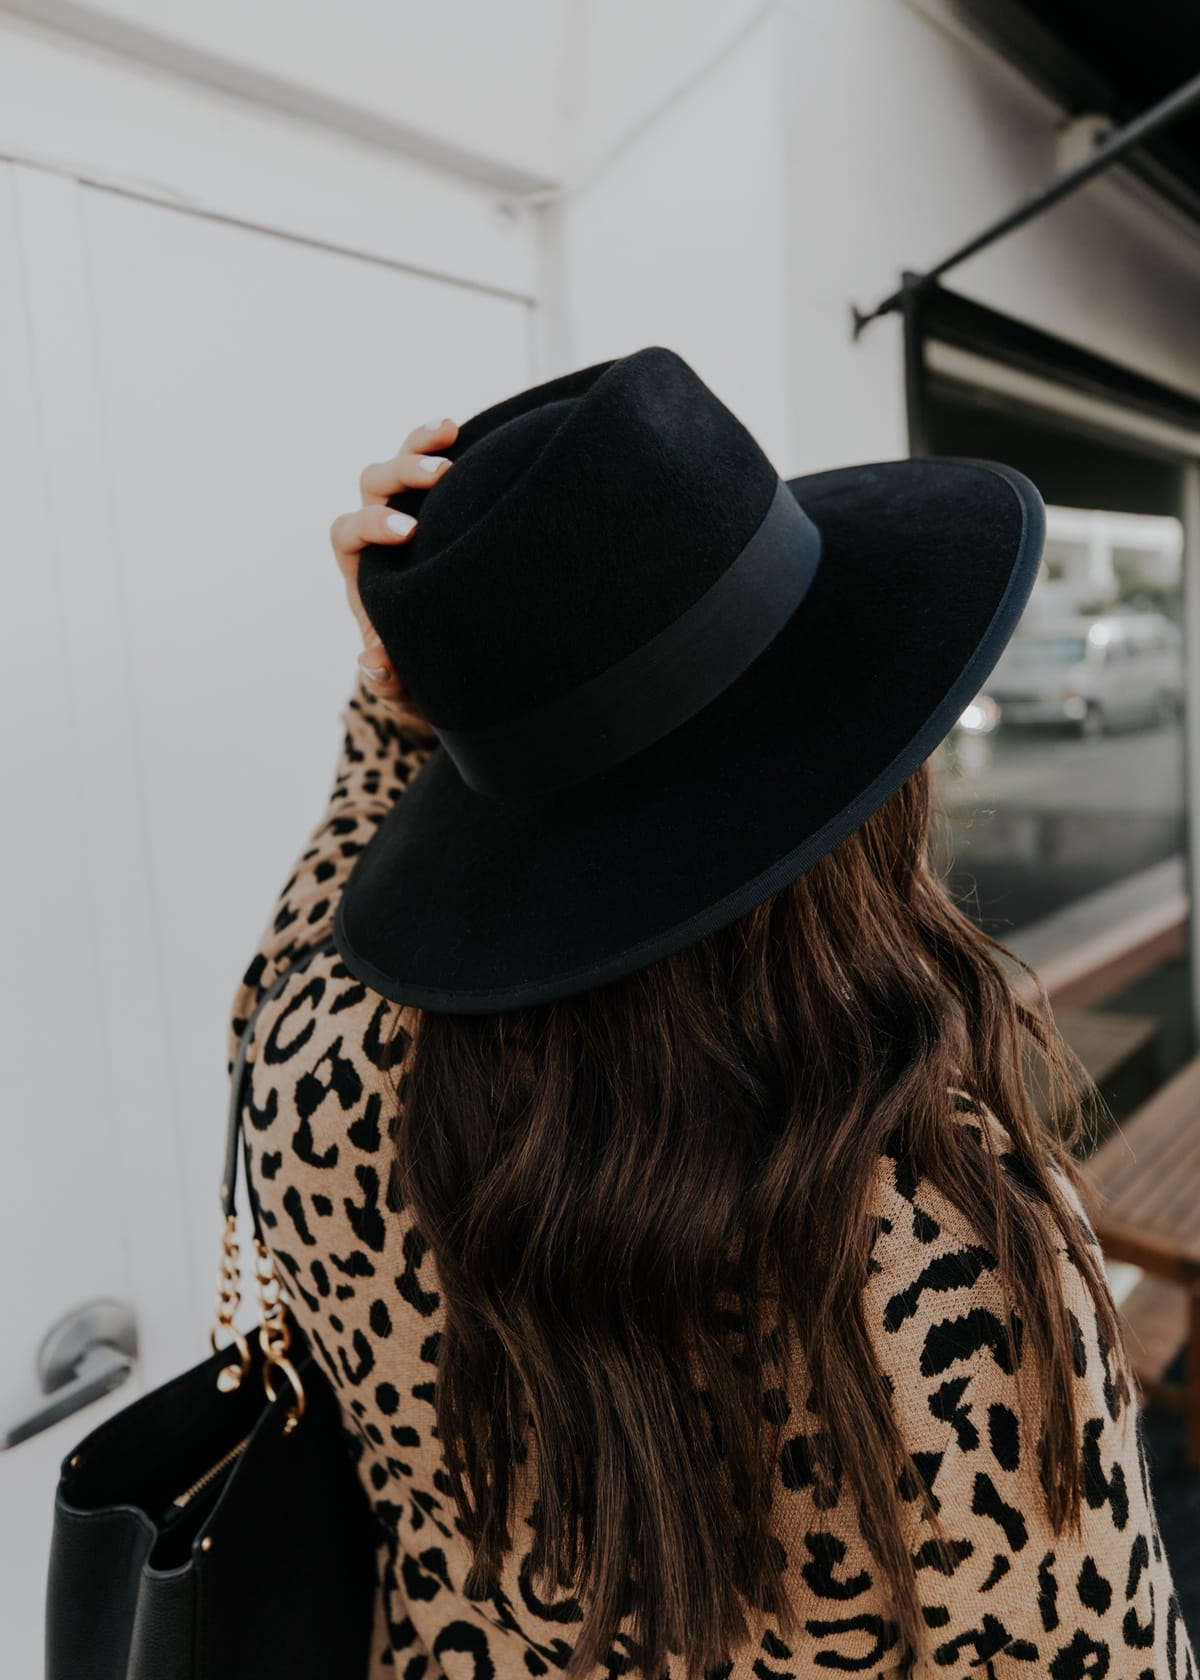 brixton black hat nordstrom